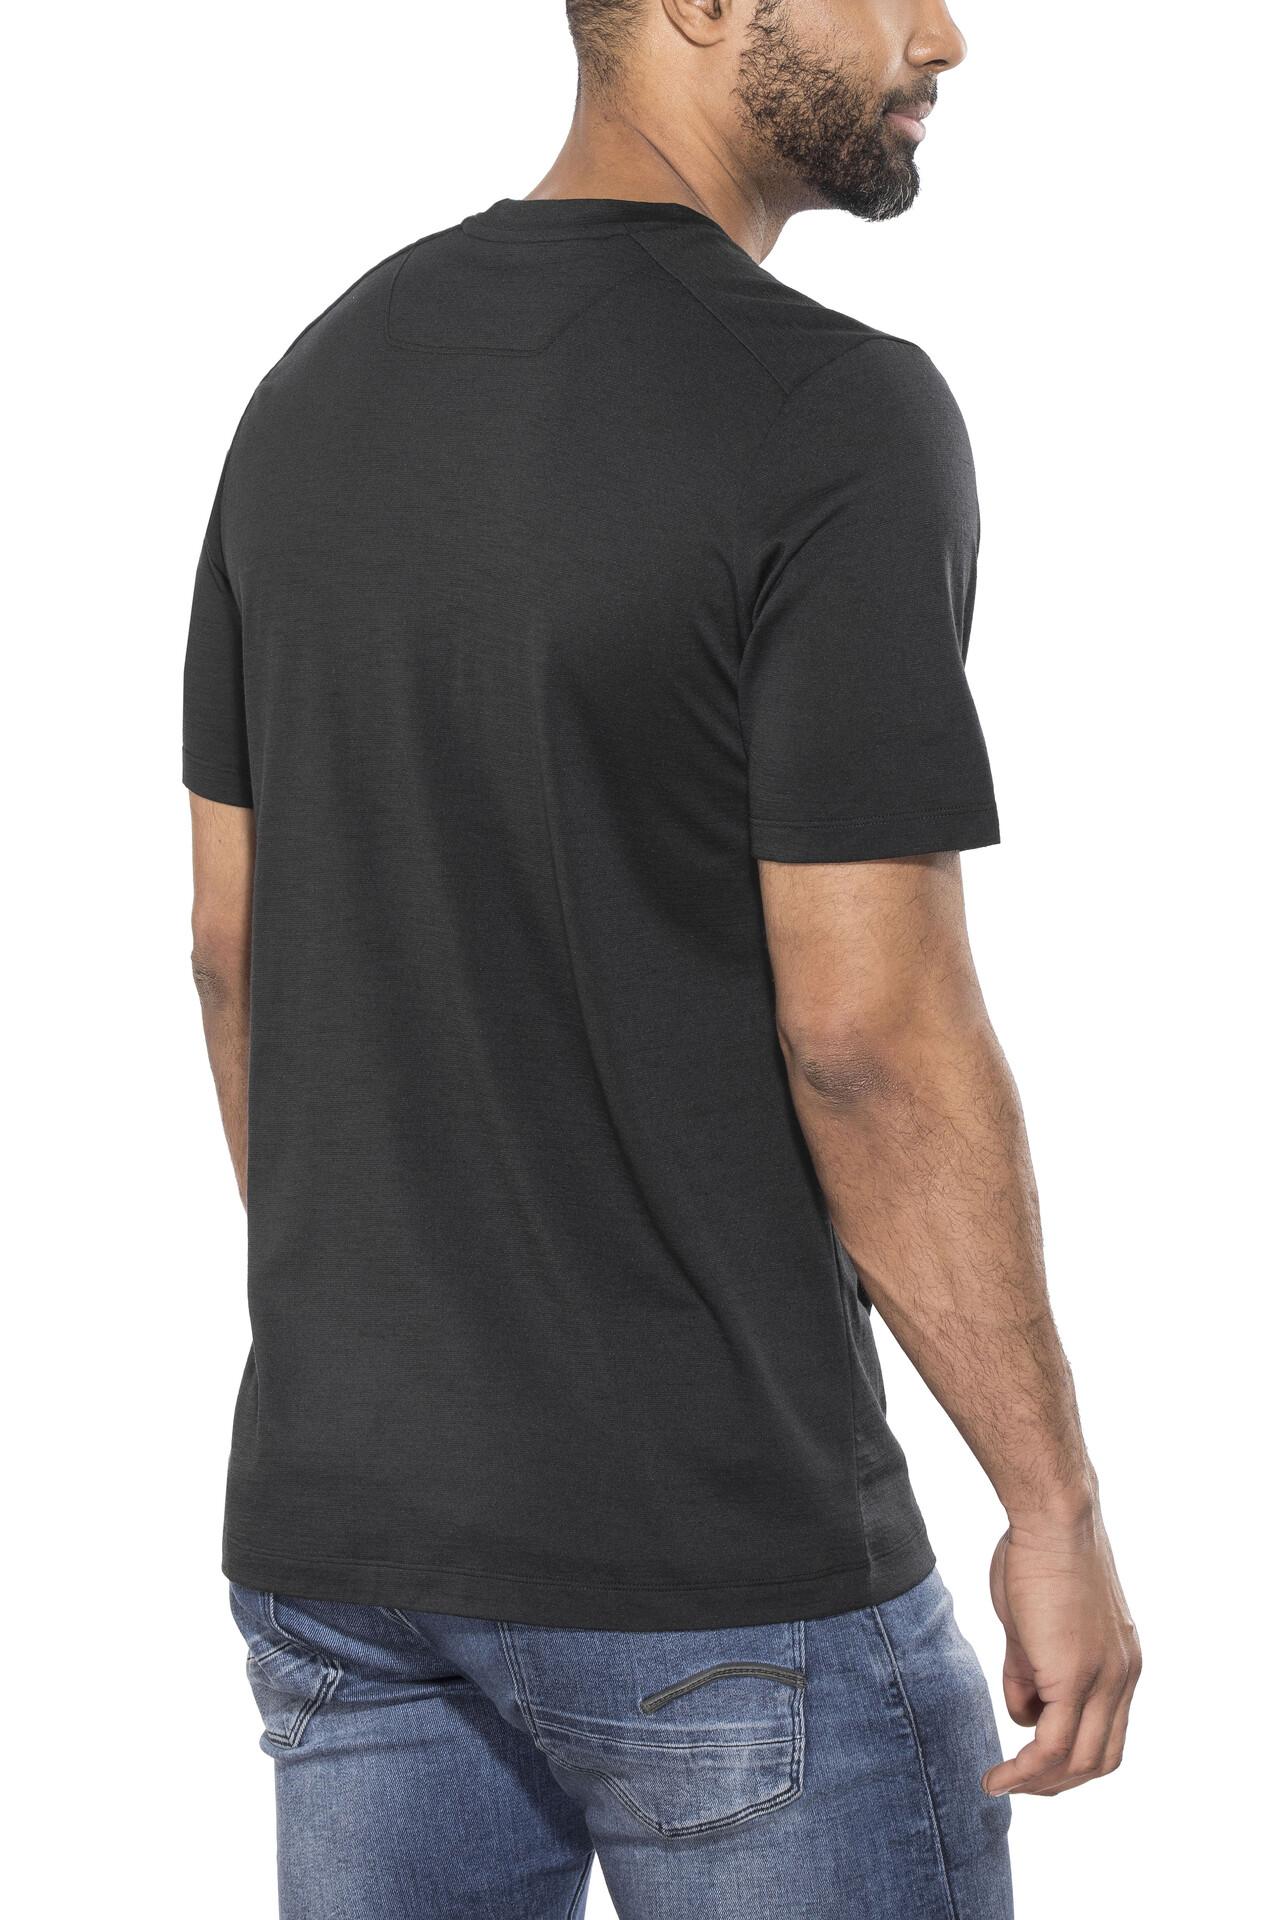 Arc'teryx A2B T shirt Herrer, black